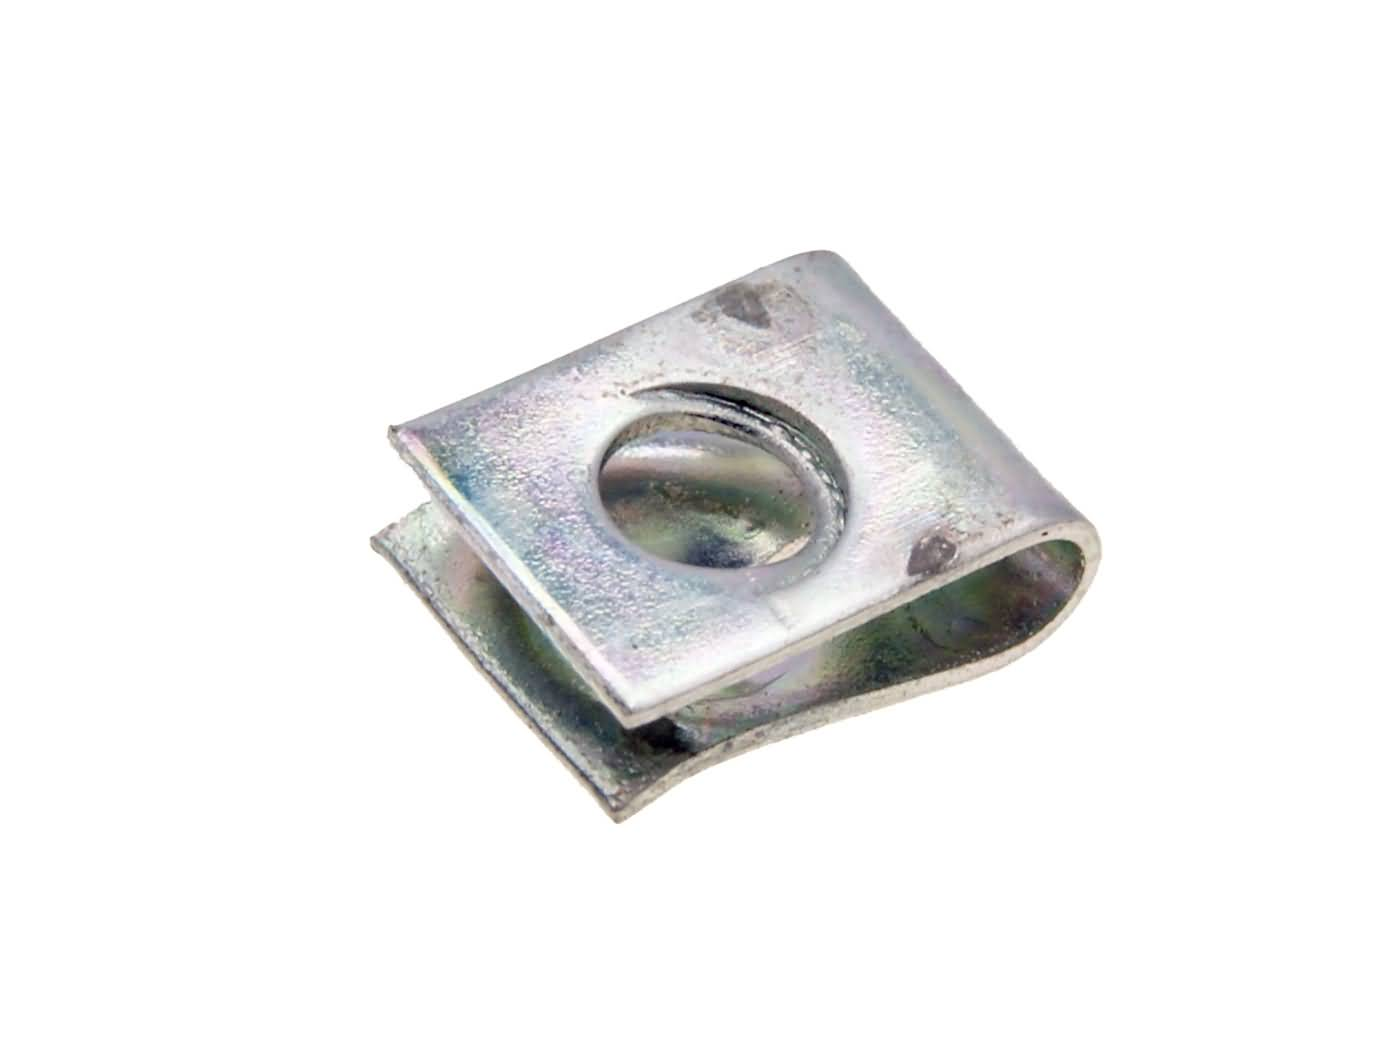 body speed nut plate nut 9x12 5 3 5mm wood thread [ 1400 x 1050 Pixel ]